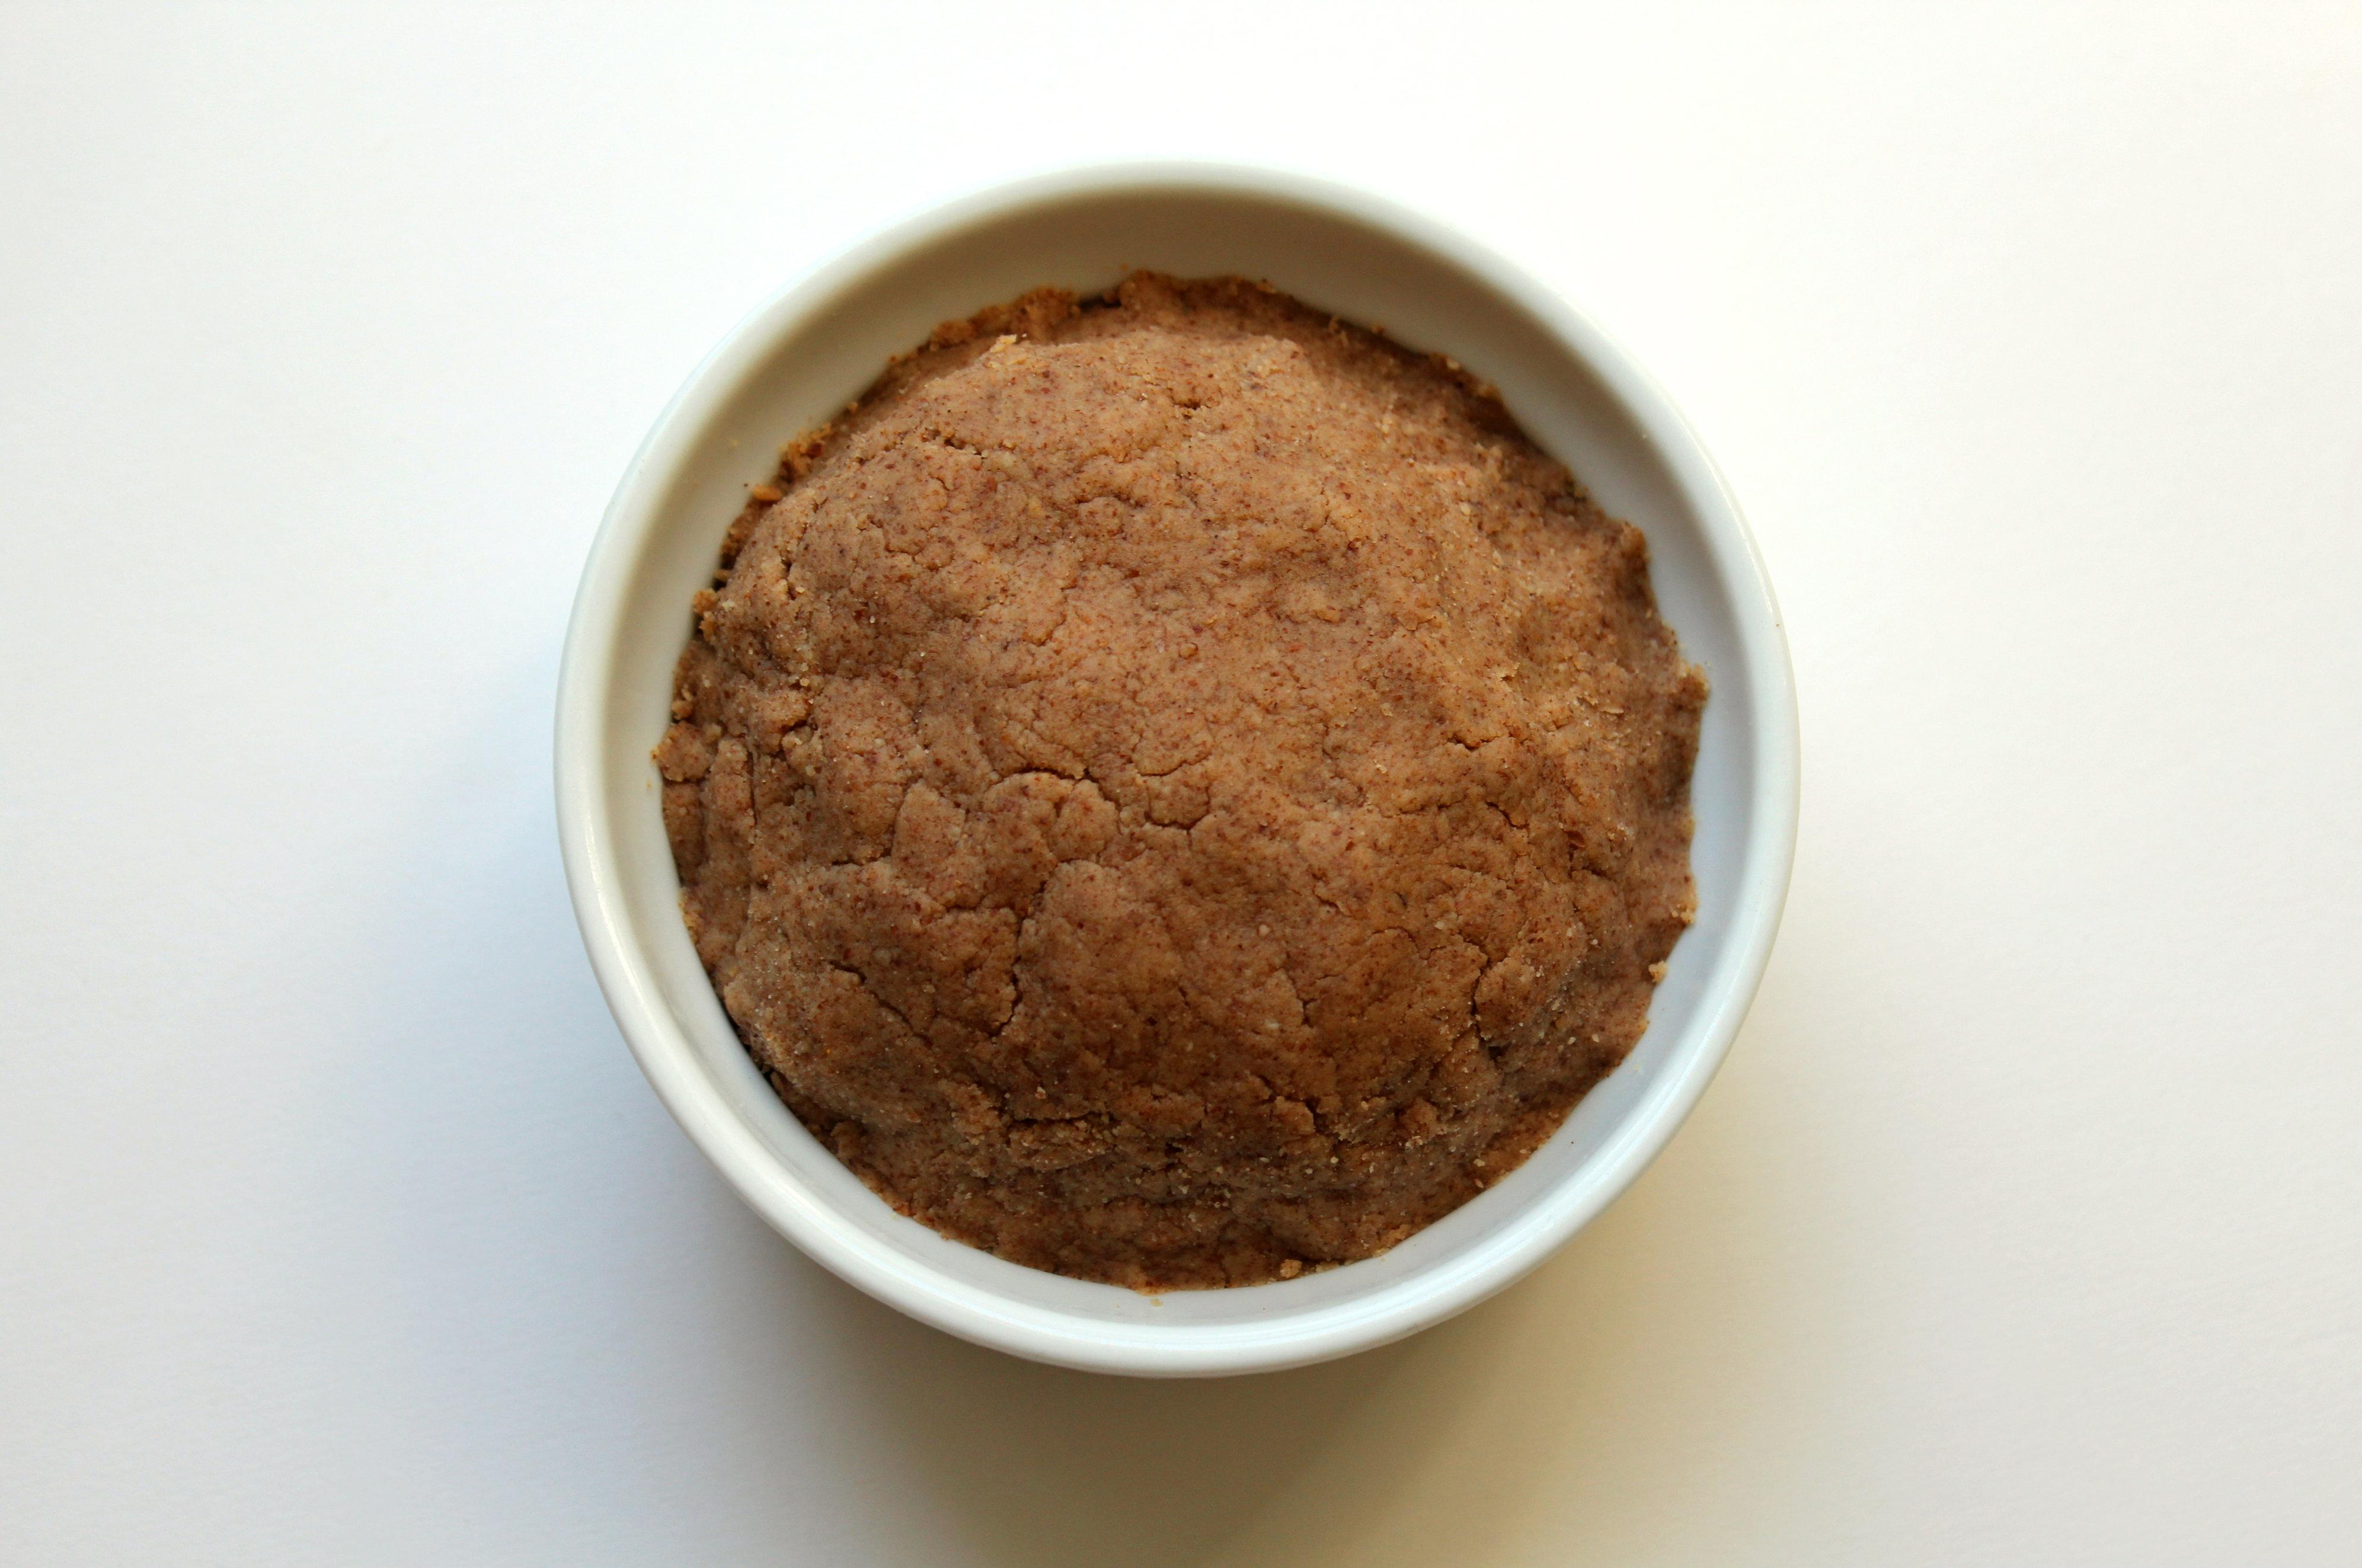 Cinnamon Roasted Almond Butter 1